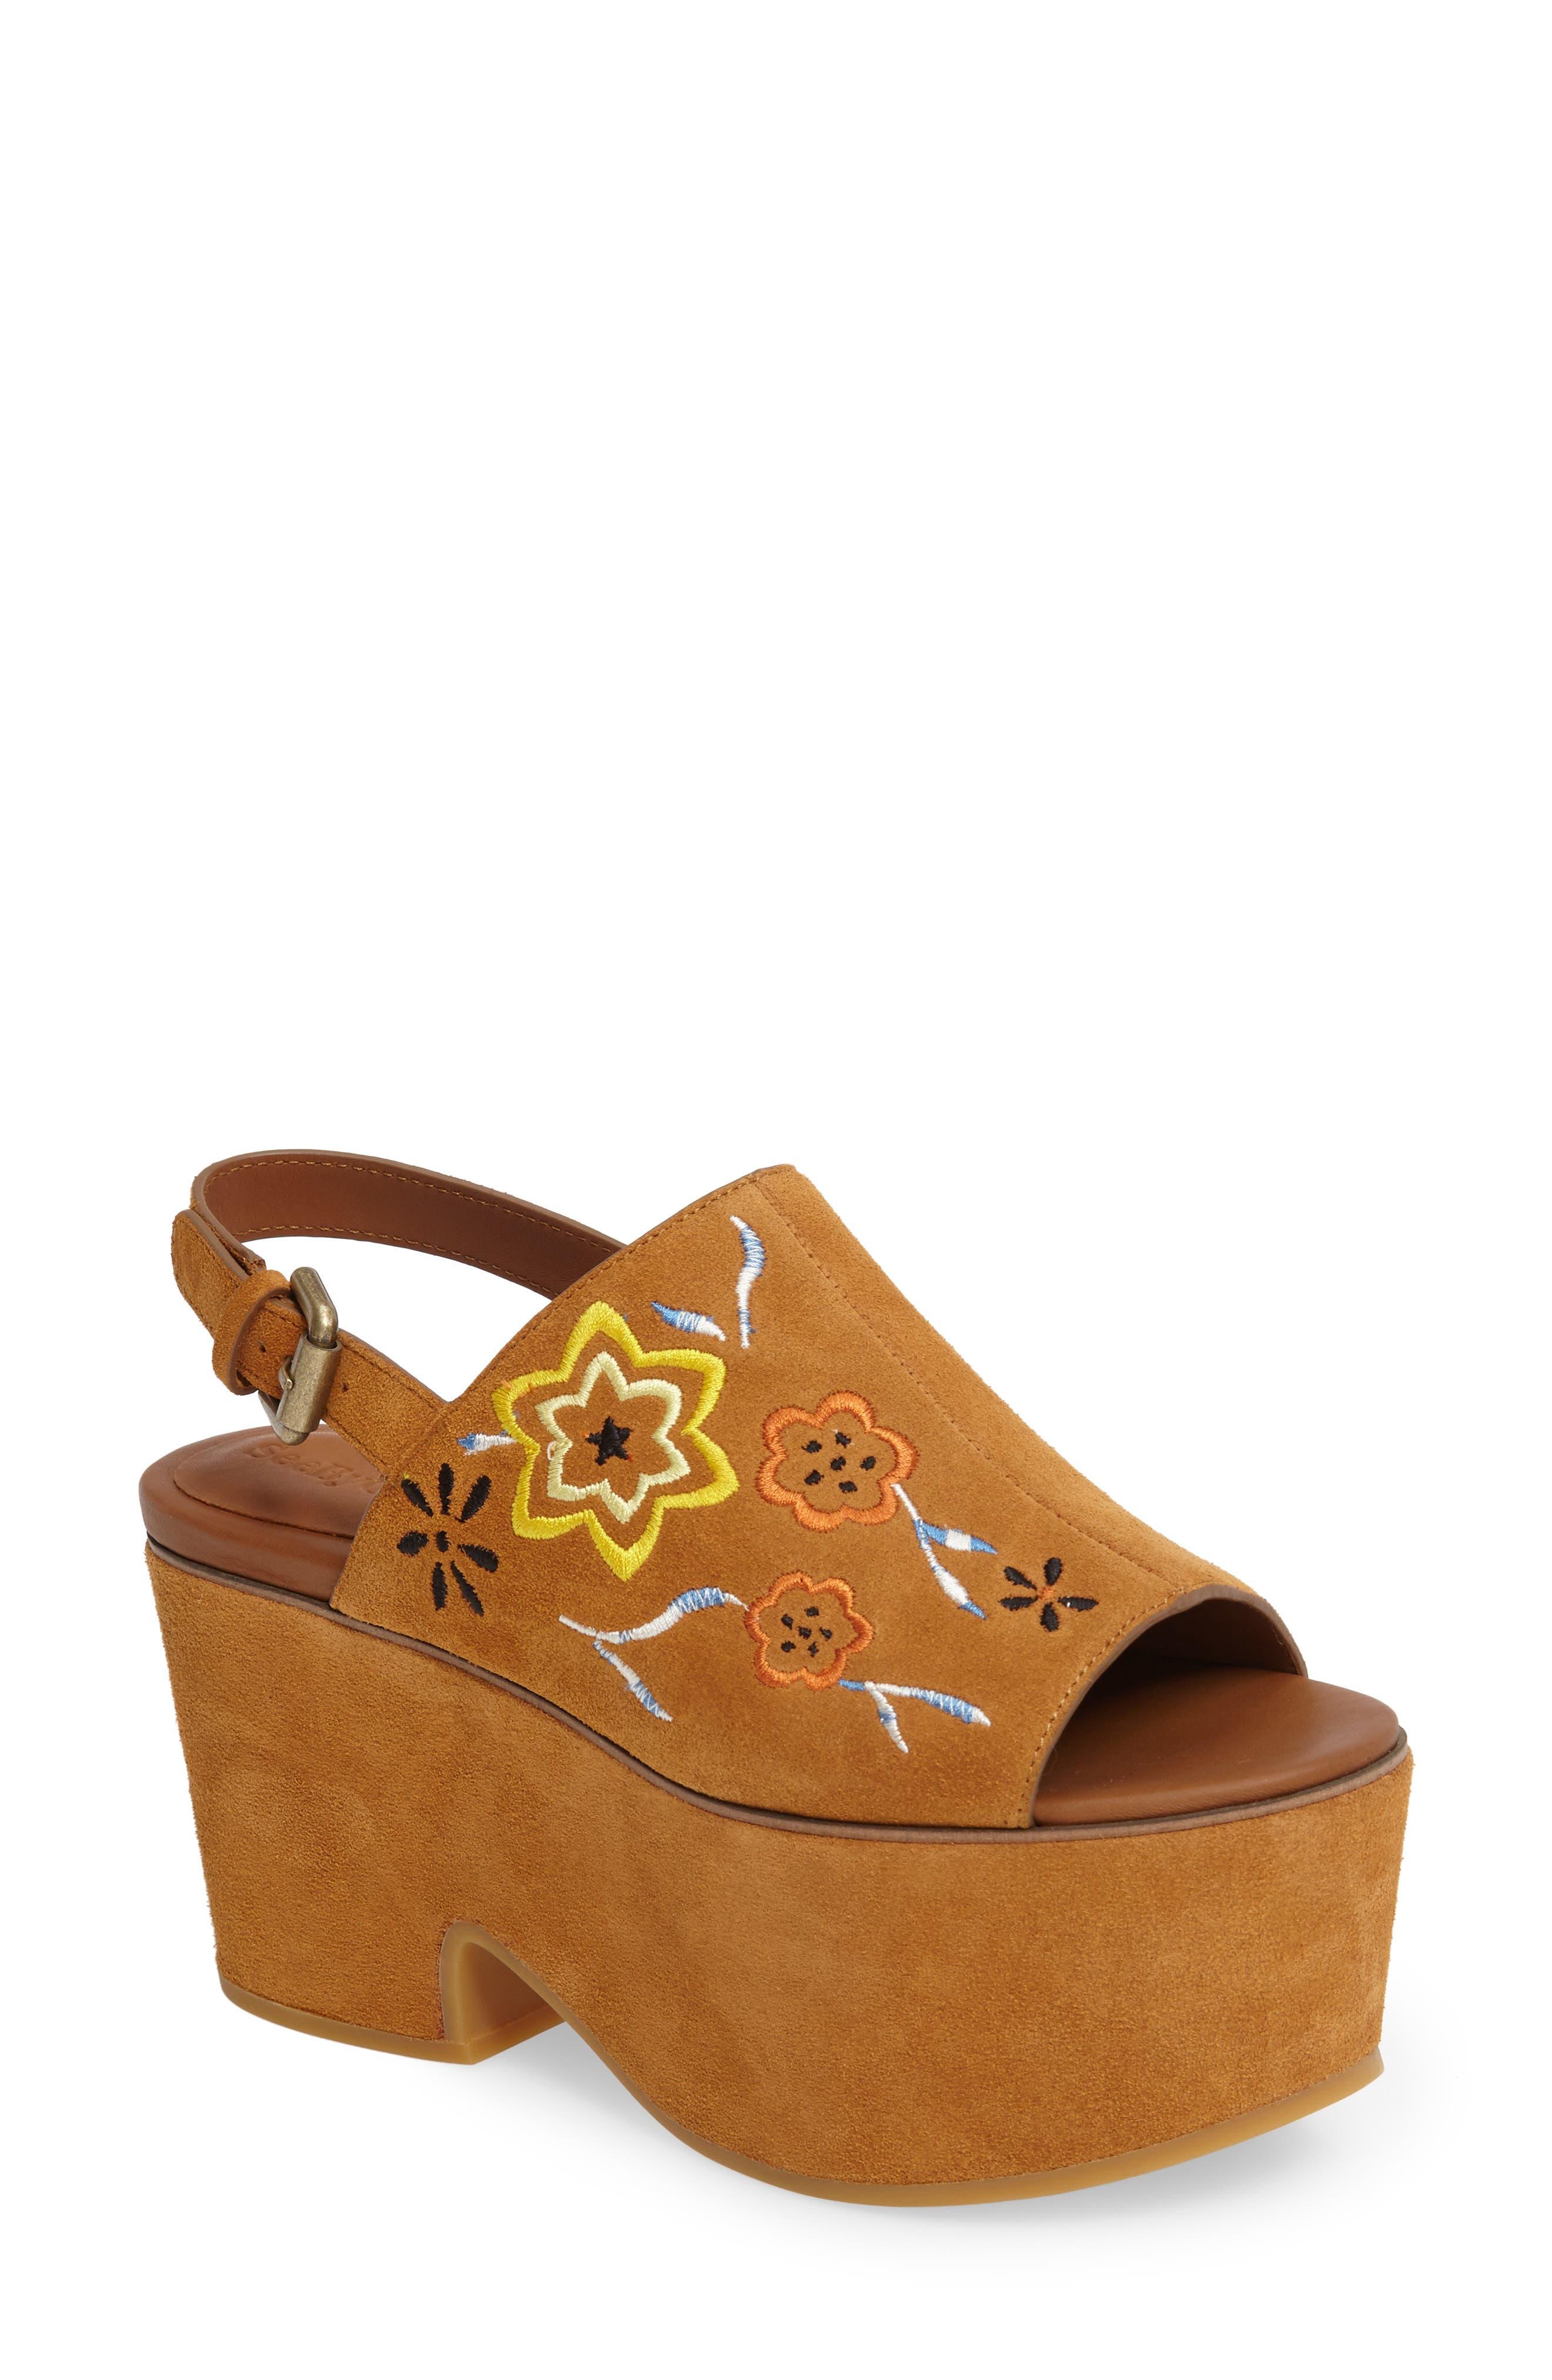 Main Image - See by Chloé Dakota Platform Sandal (Women)